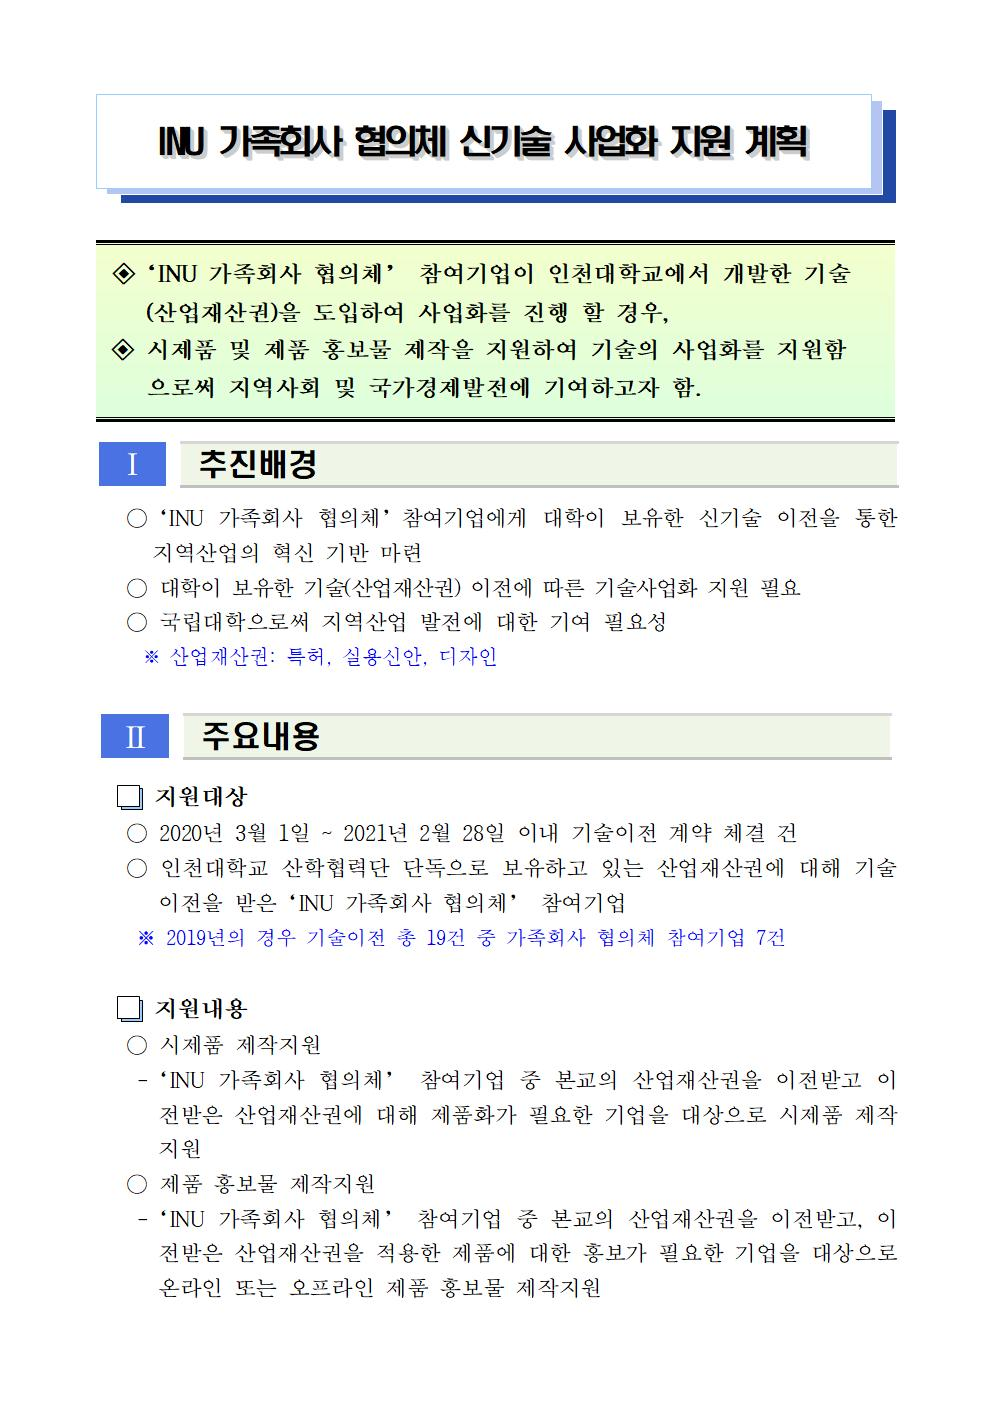 「INU 가족회사 협의체」 신기술 사업화 지원 계획 (안)001.jpg